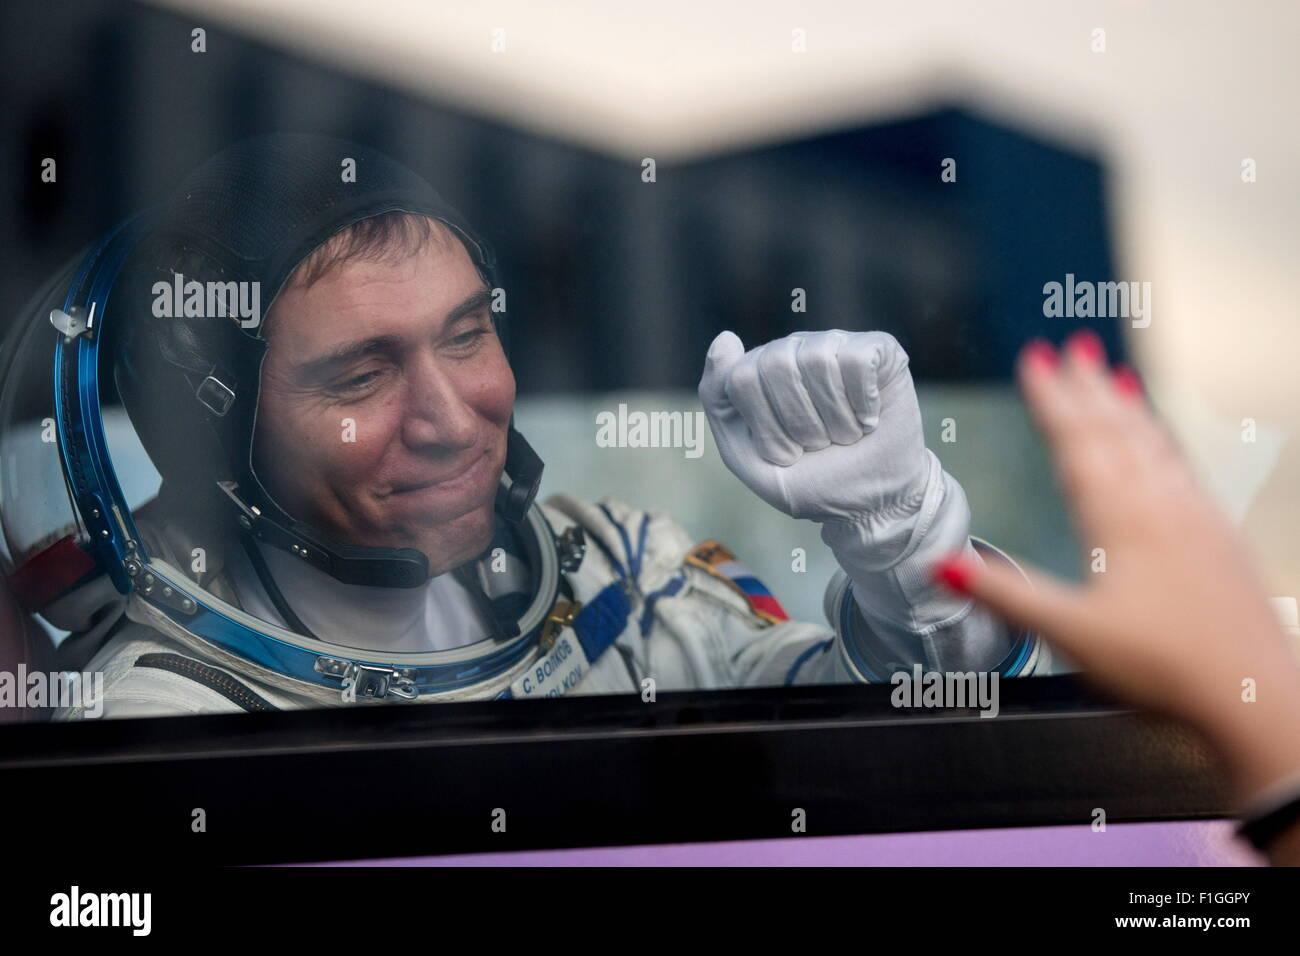 Baikonur, Kazakhstan. 2nd Sep, 2015. ISS Expedition 45/46 main crew member, Roscosmos cosmonaut Sergei Volkov seen Stock Photo